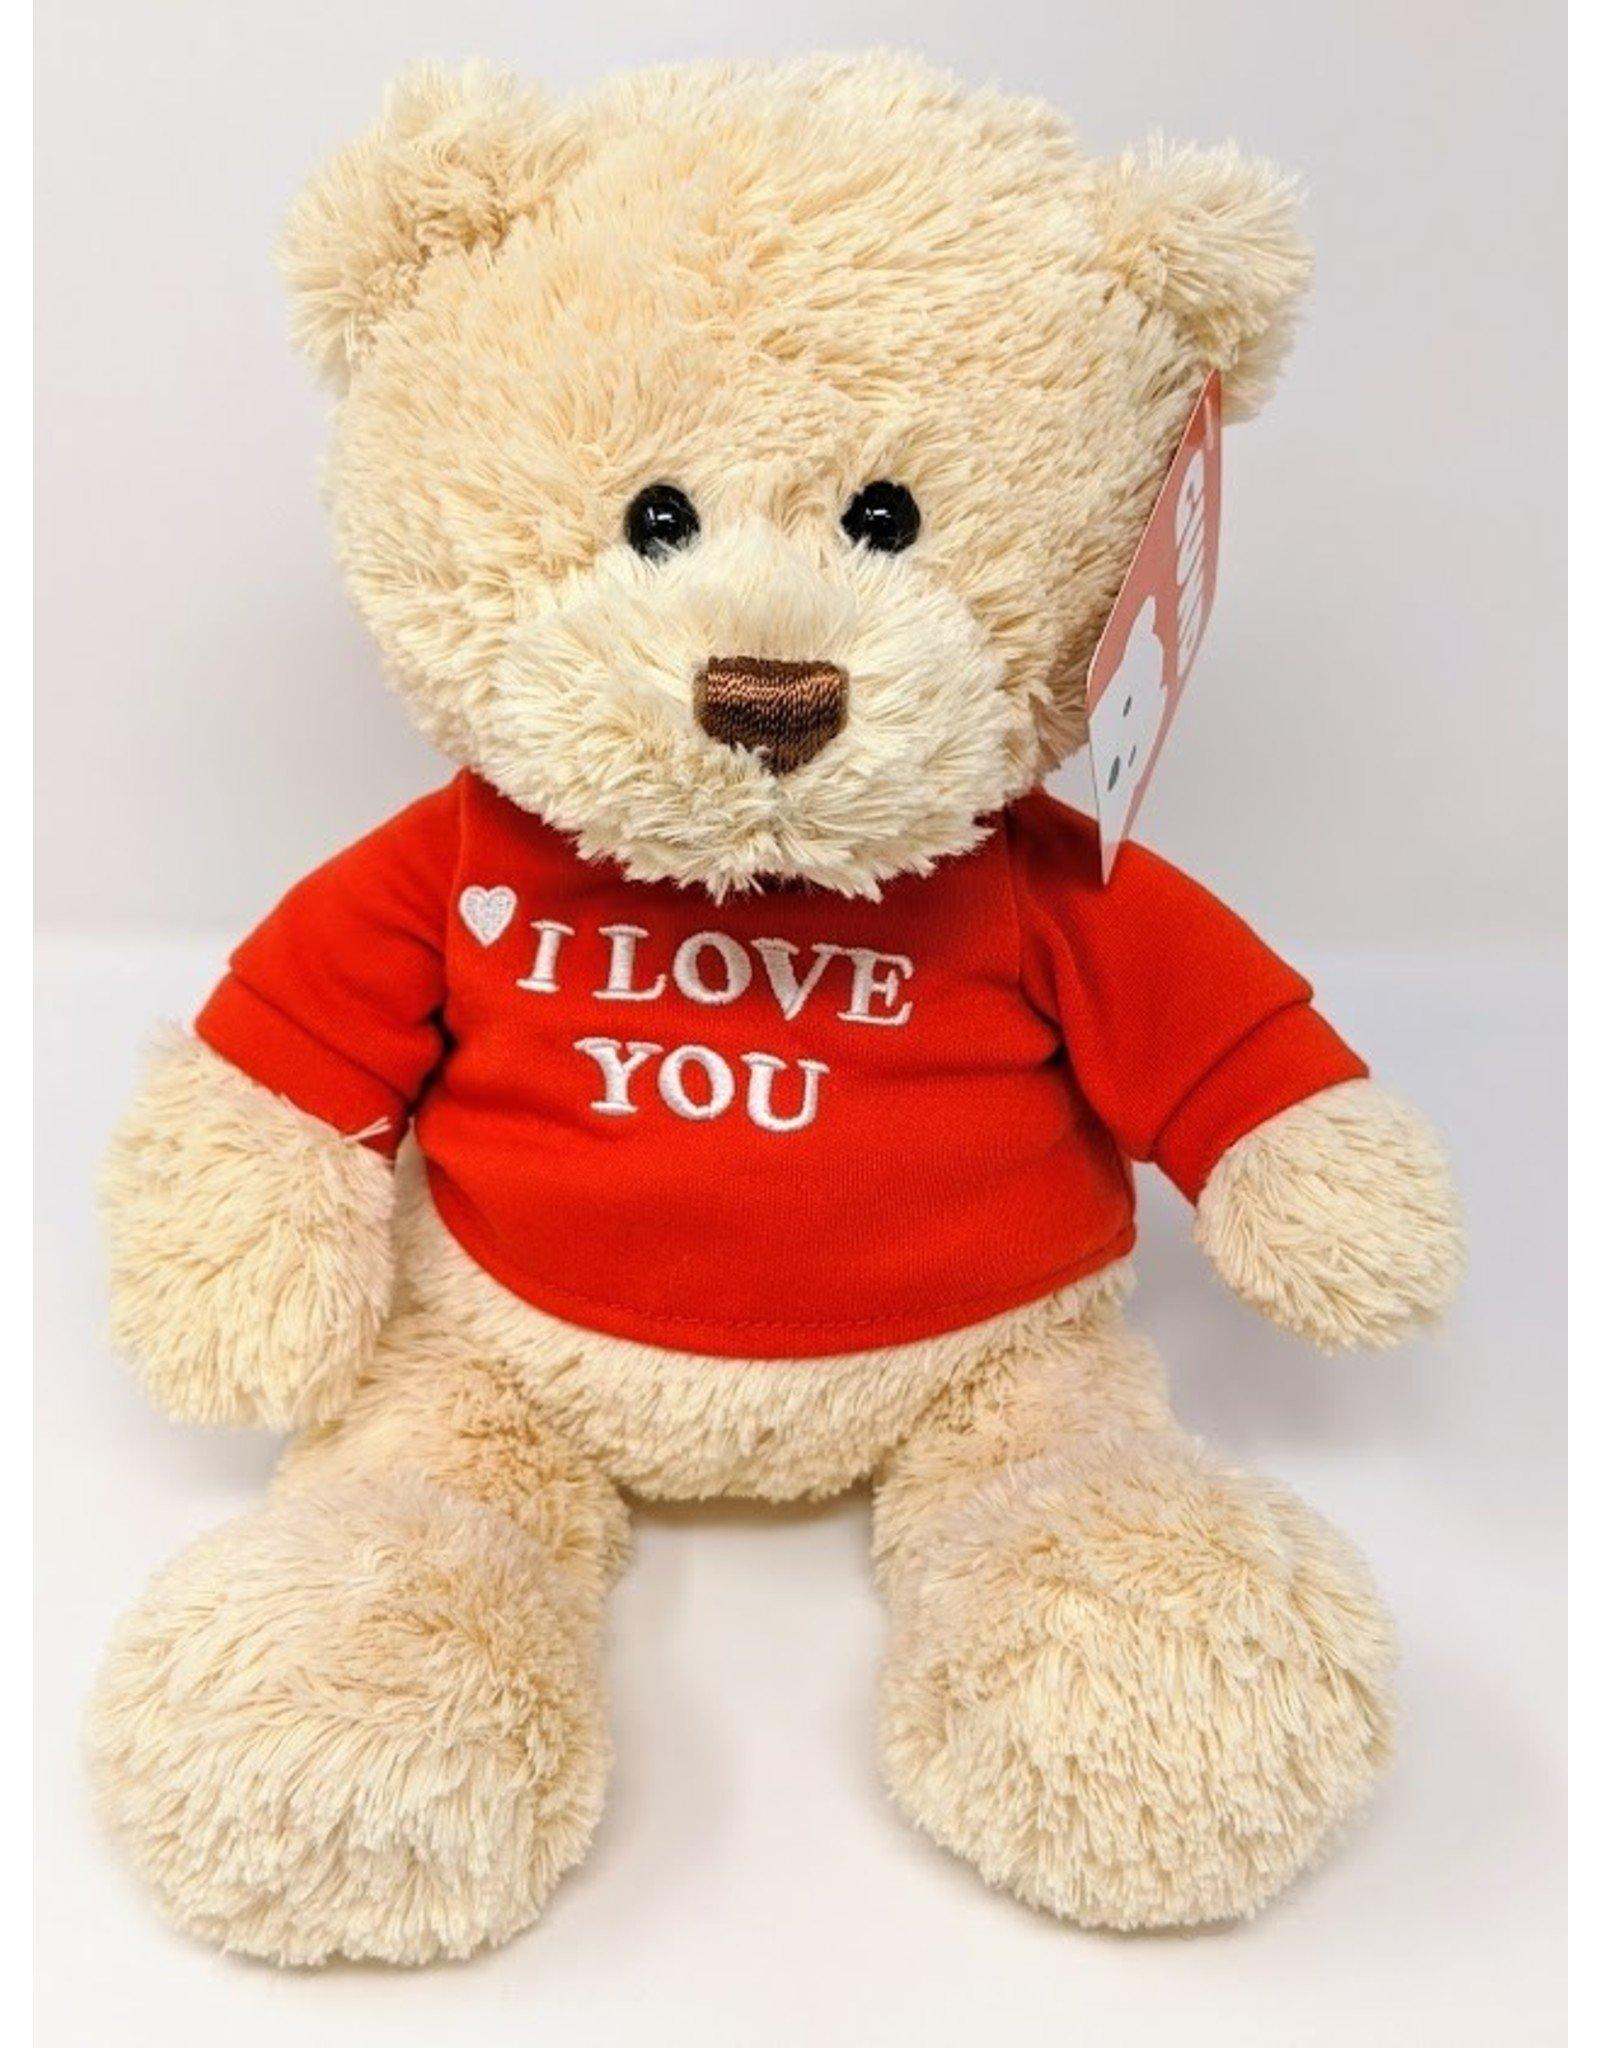 I Love You Bear - red shirt